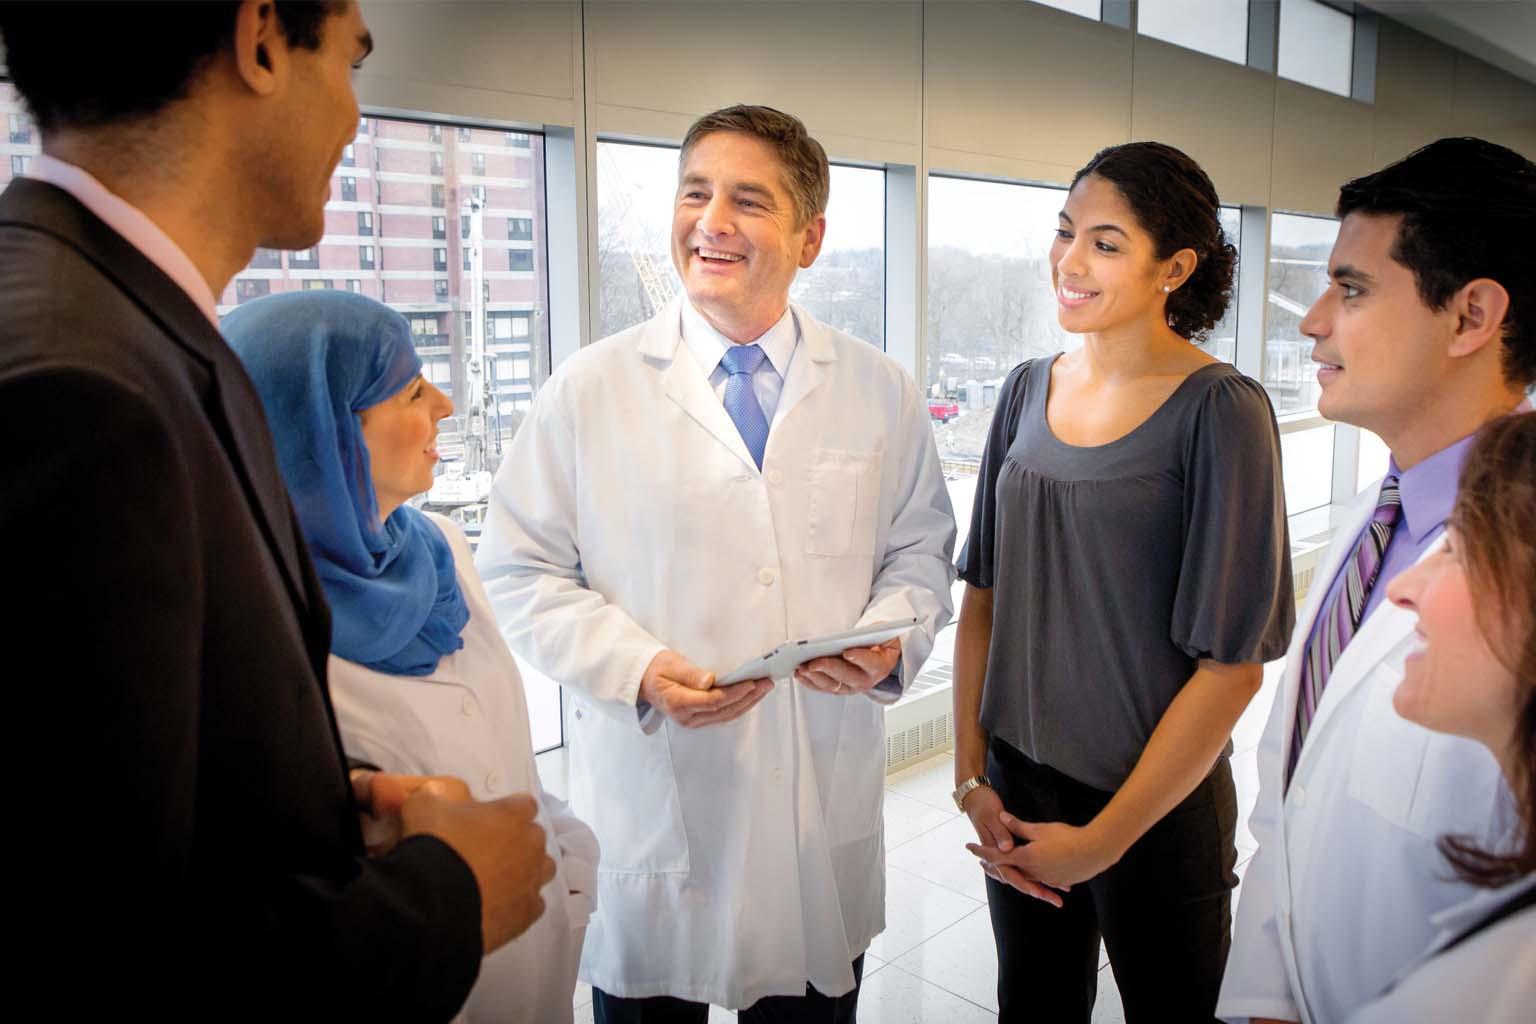 group of doctors talking in hallway